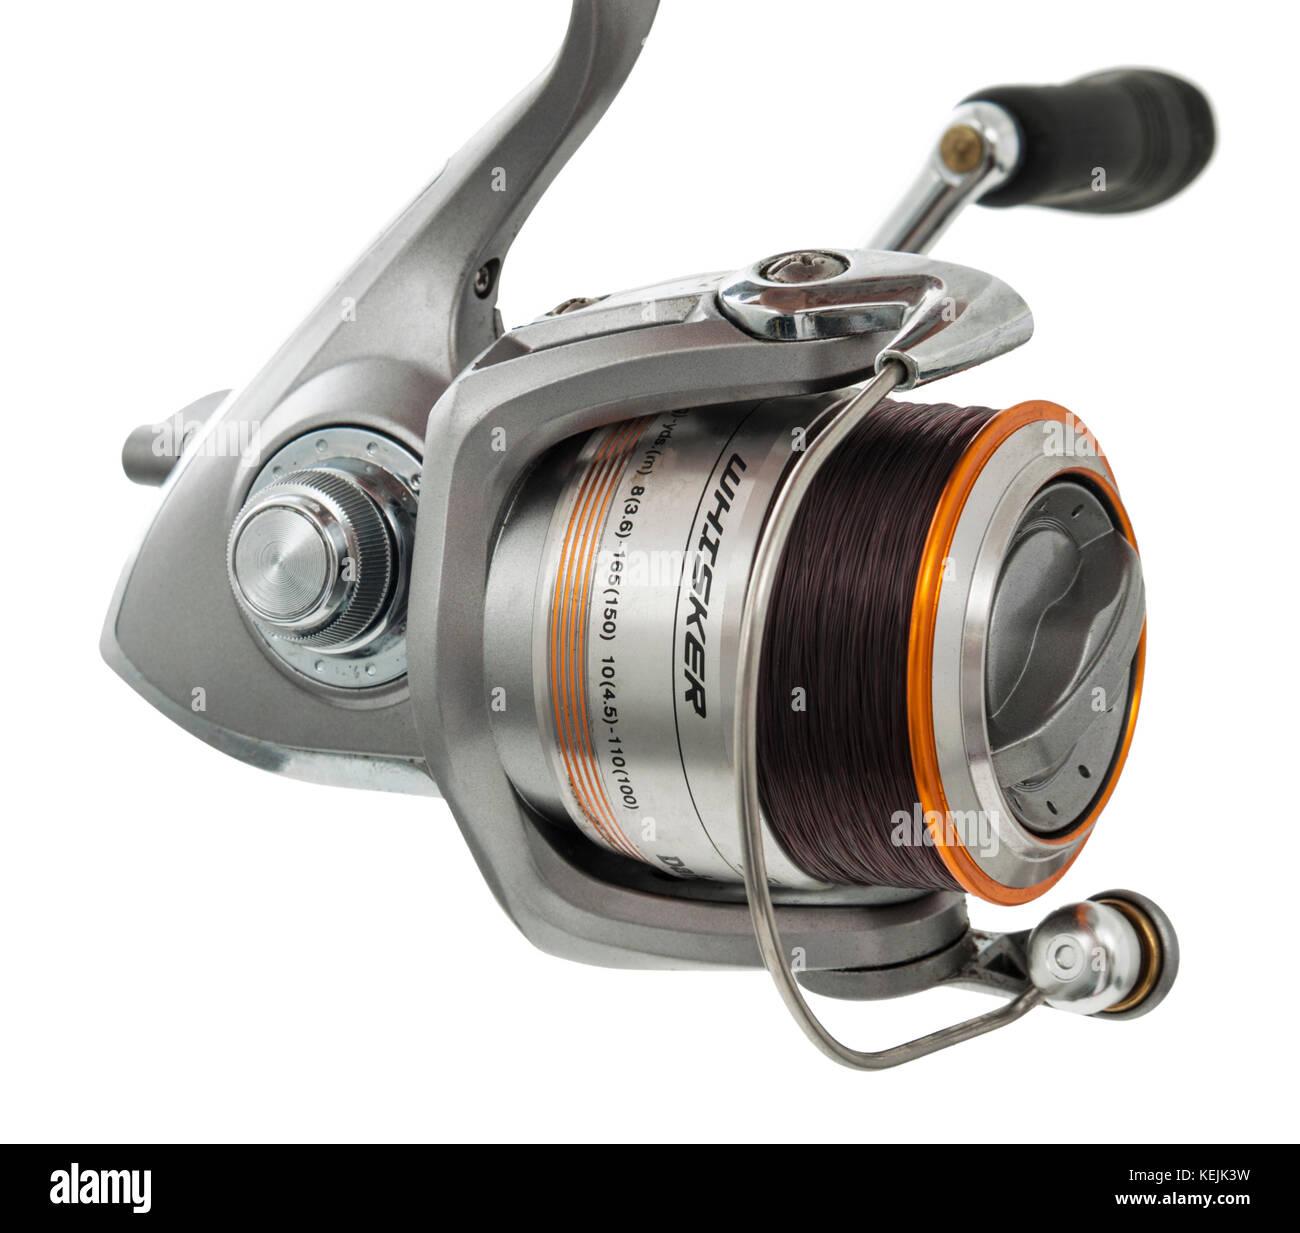 Daiwa Whisker Match coarse fishing reel against white background - Stock Image